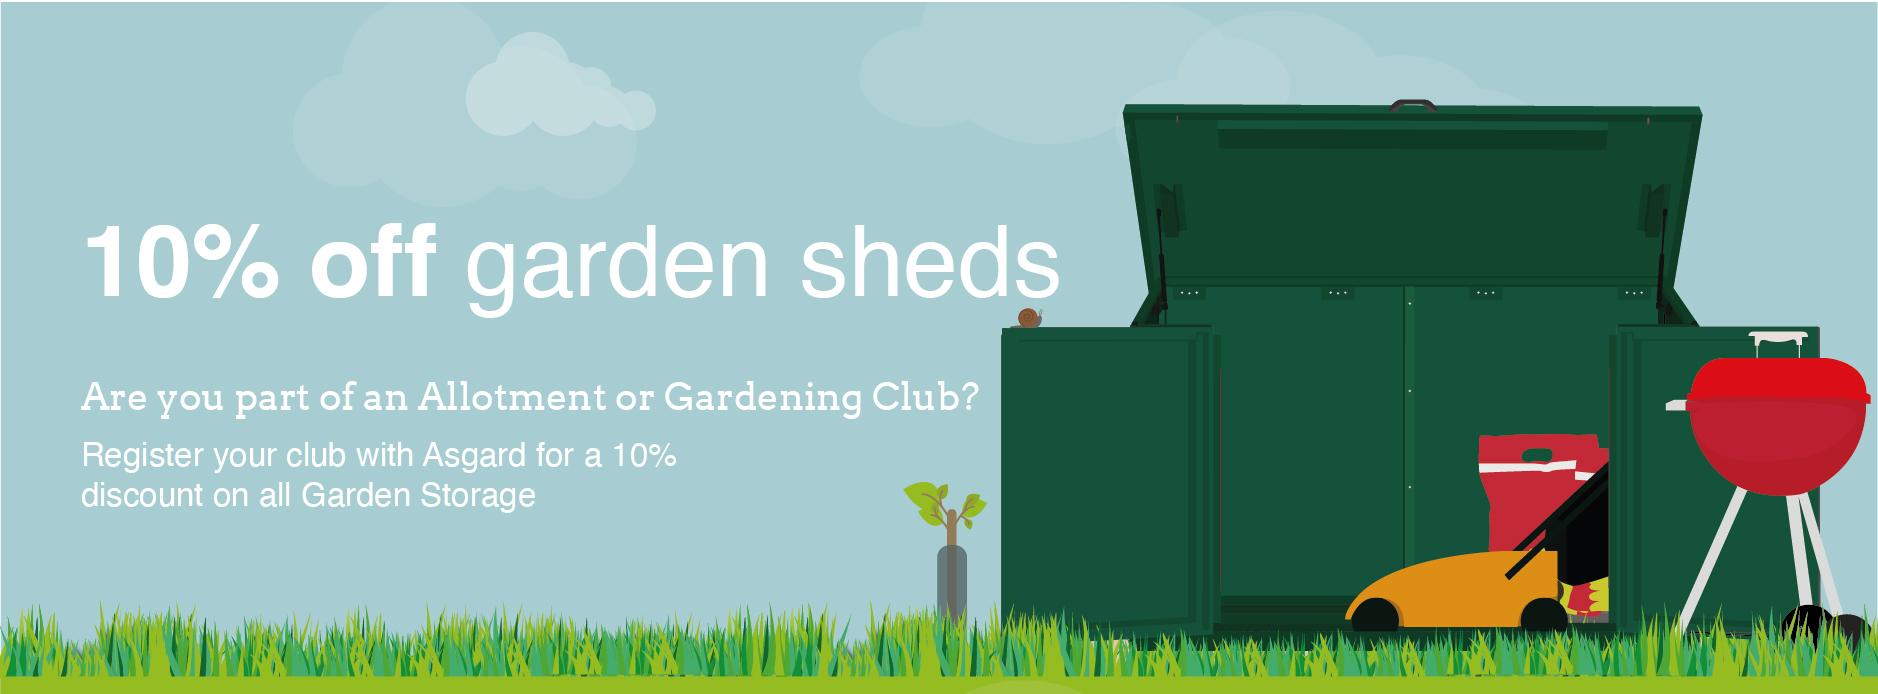 Asgard garden shed discounts